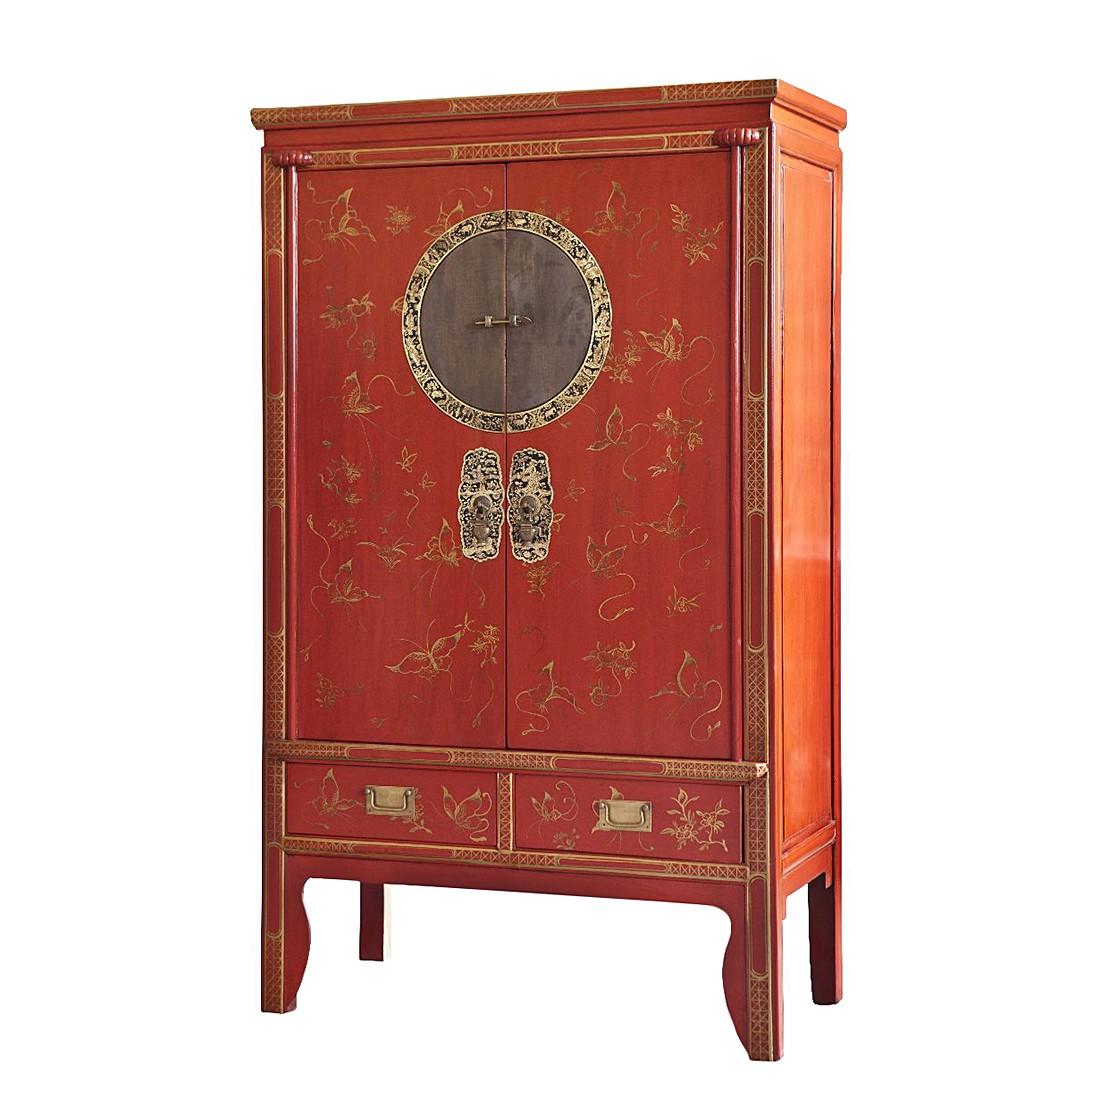 Hochzeitsschrank Jinan I - Pappel massiv/Rot lackiert, ars manufacti